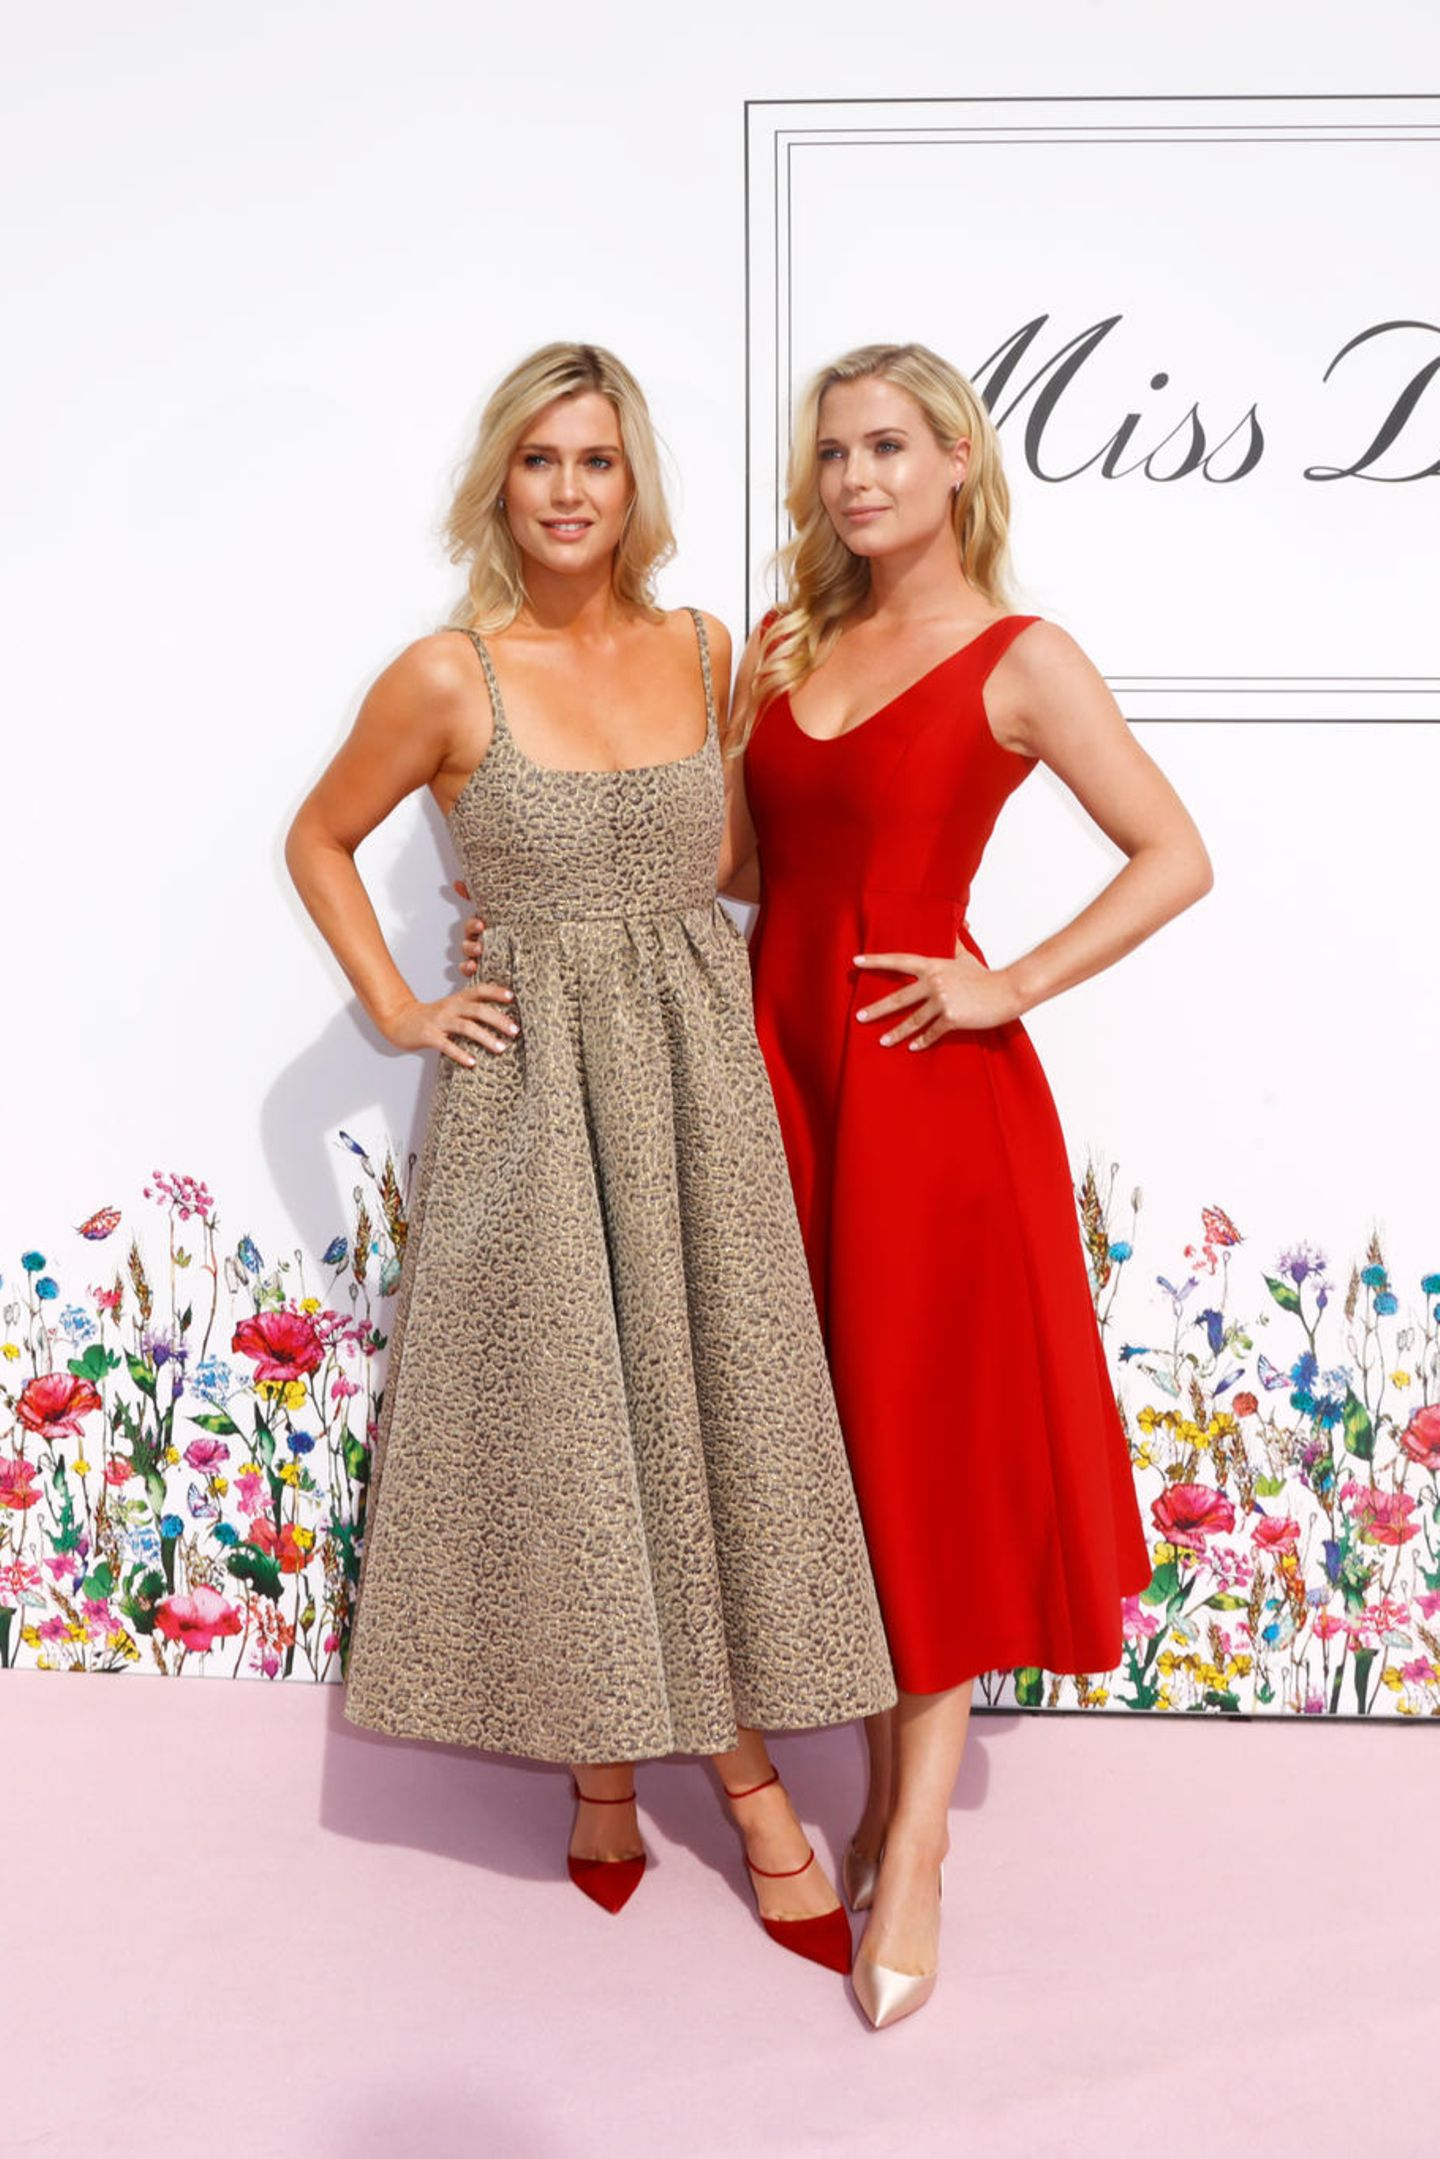 Lady Eliza Spencer und Lady Amelia Spencer auf dem Red Carpet.